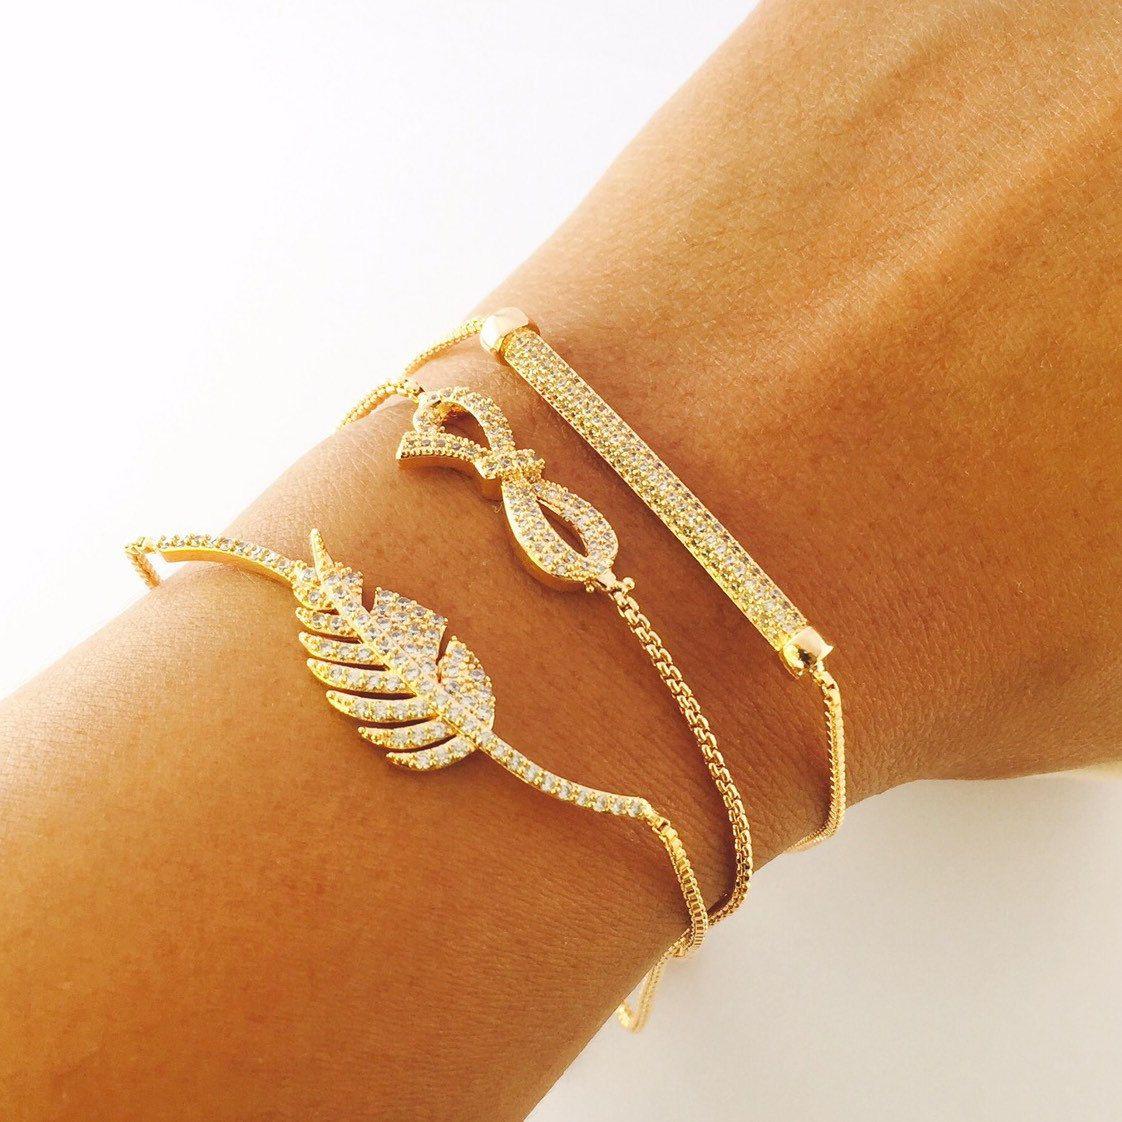 Infinityloveco bow bracelet ❤✨🛍 Keep calm and put the beautiful bracelet on🎀🎉